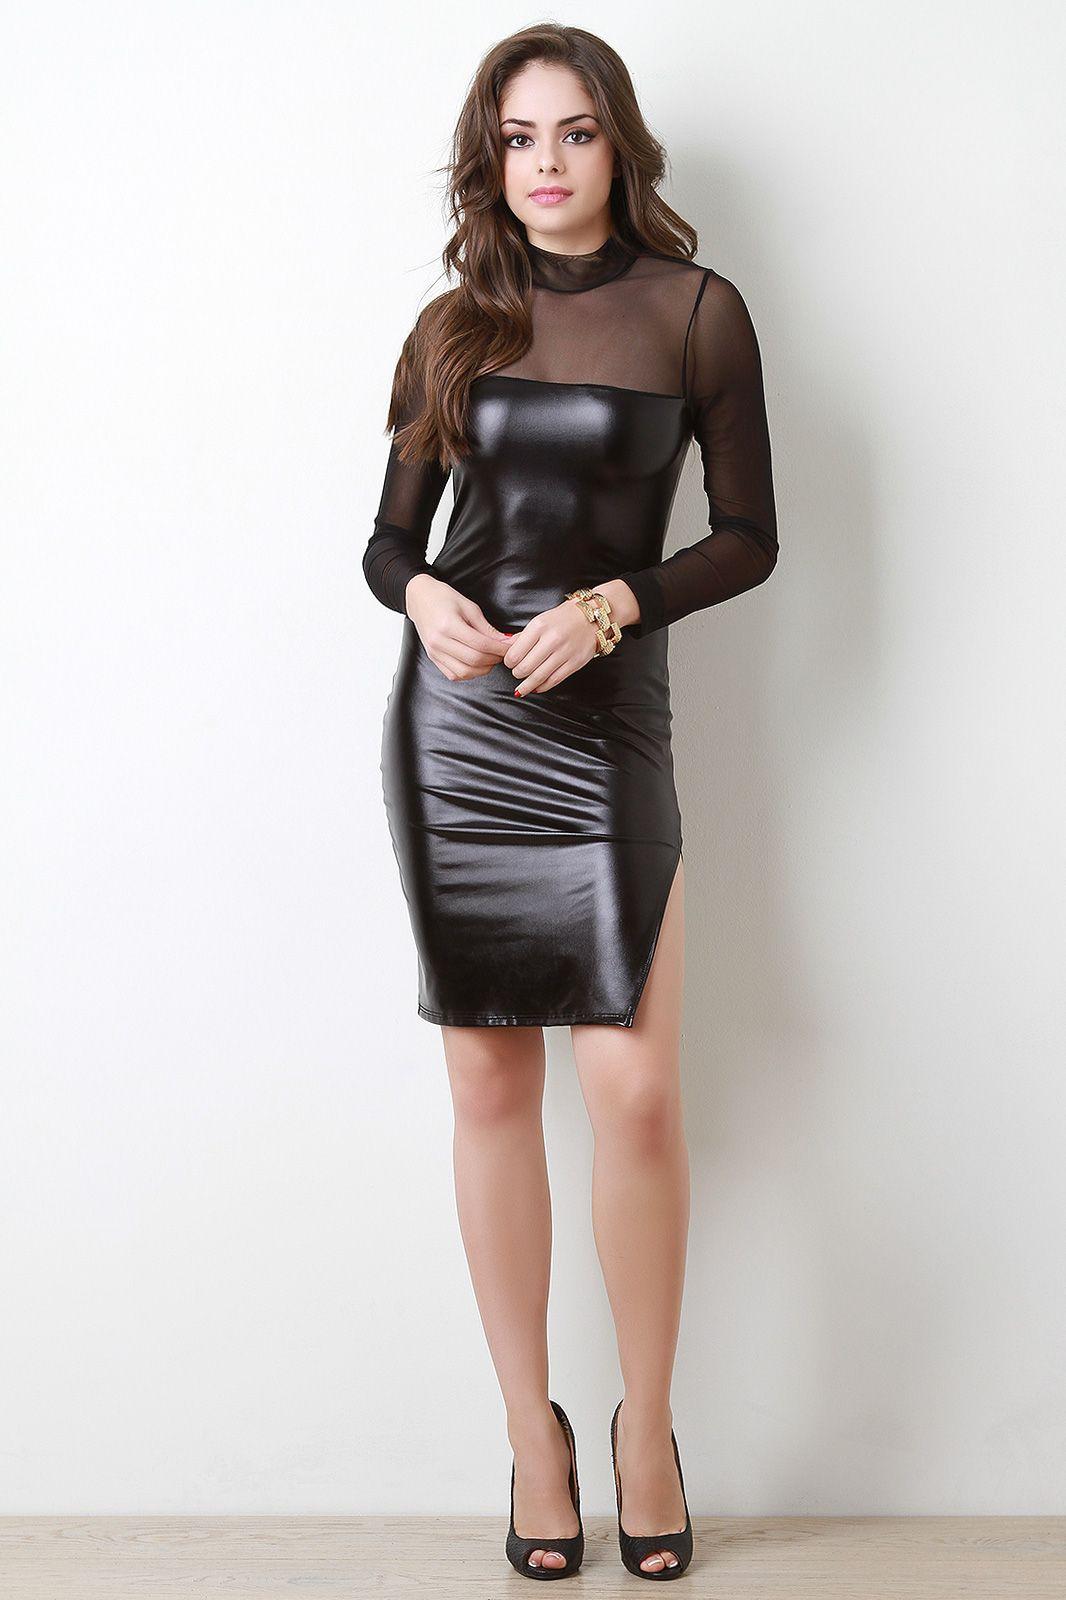 Skirt Waisted and crop top o